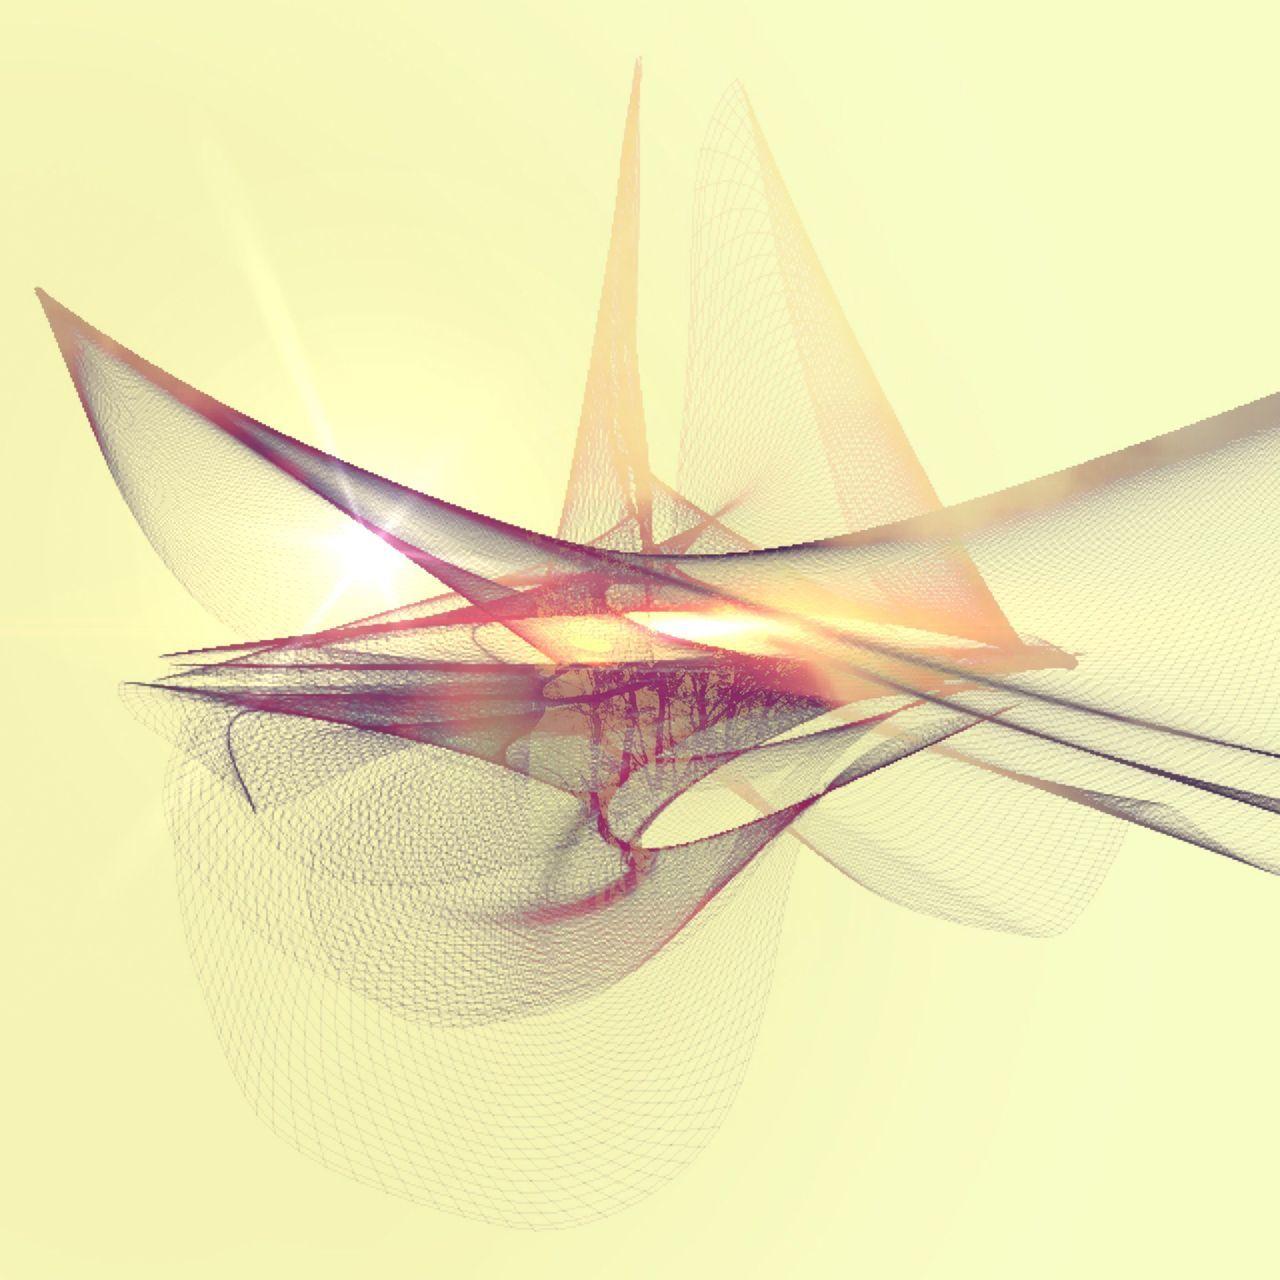 SAIL II Abstractart Conceptual Sailing Light